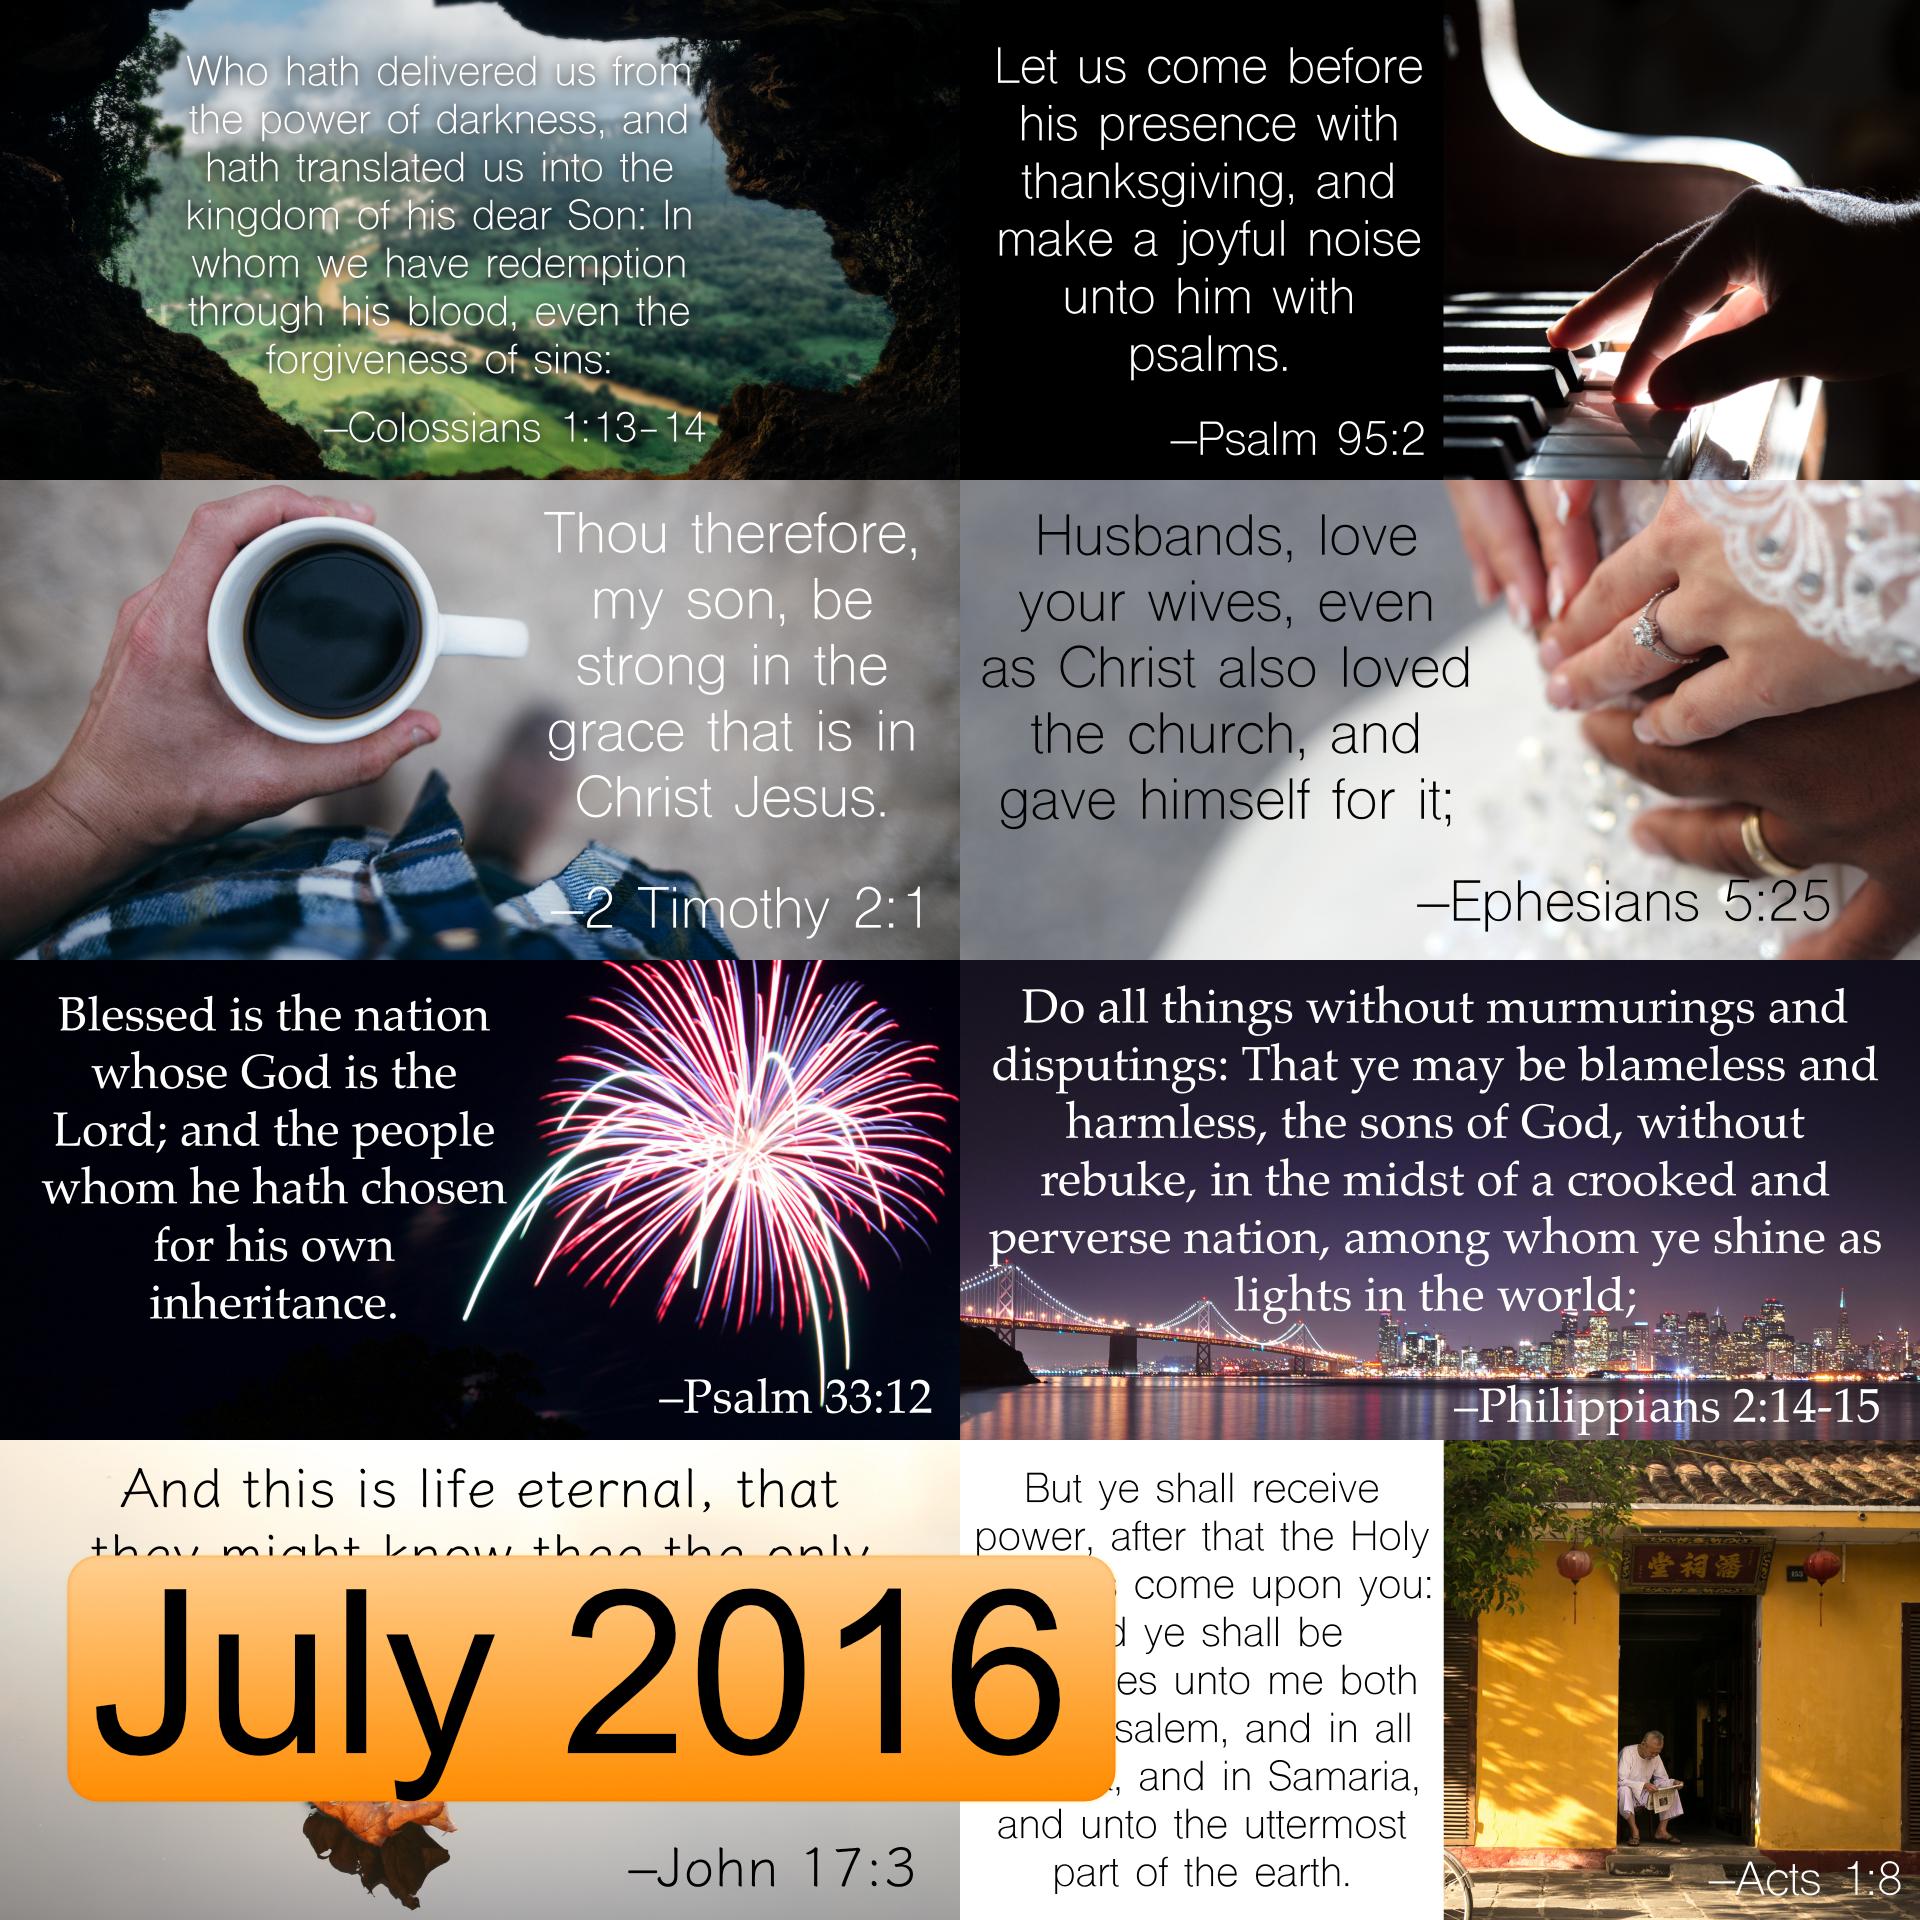 July 2016 Image Pack